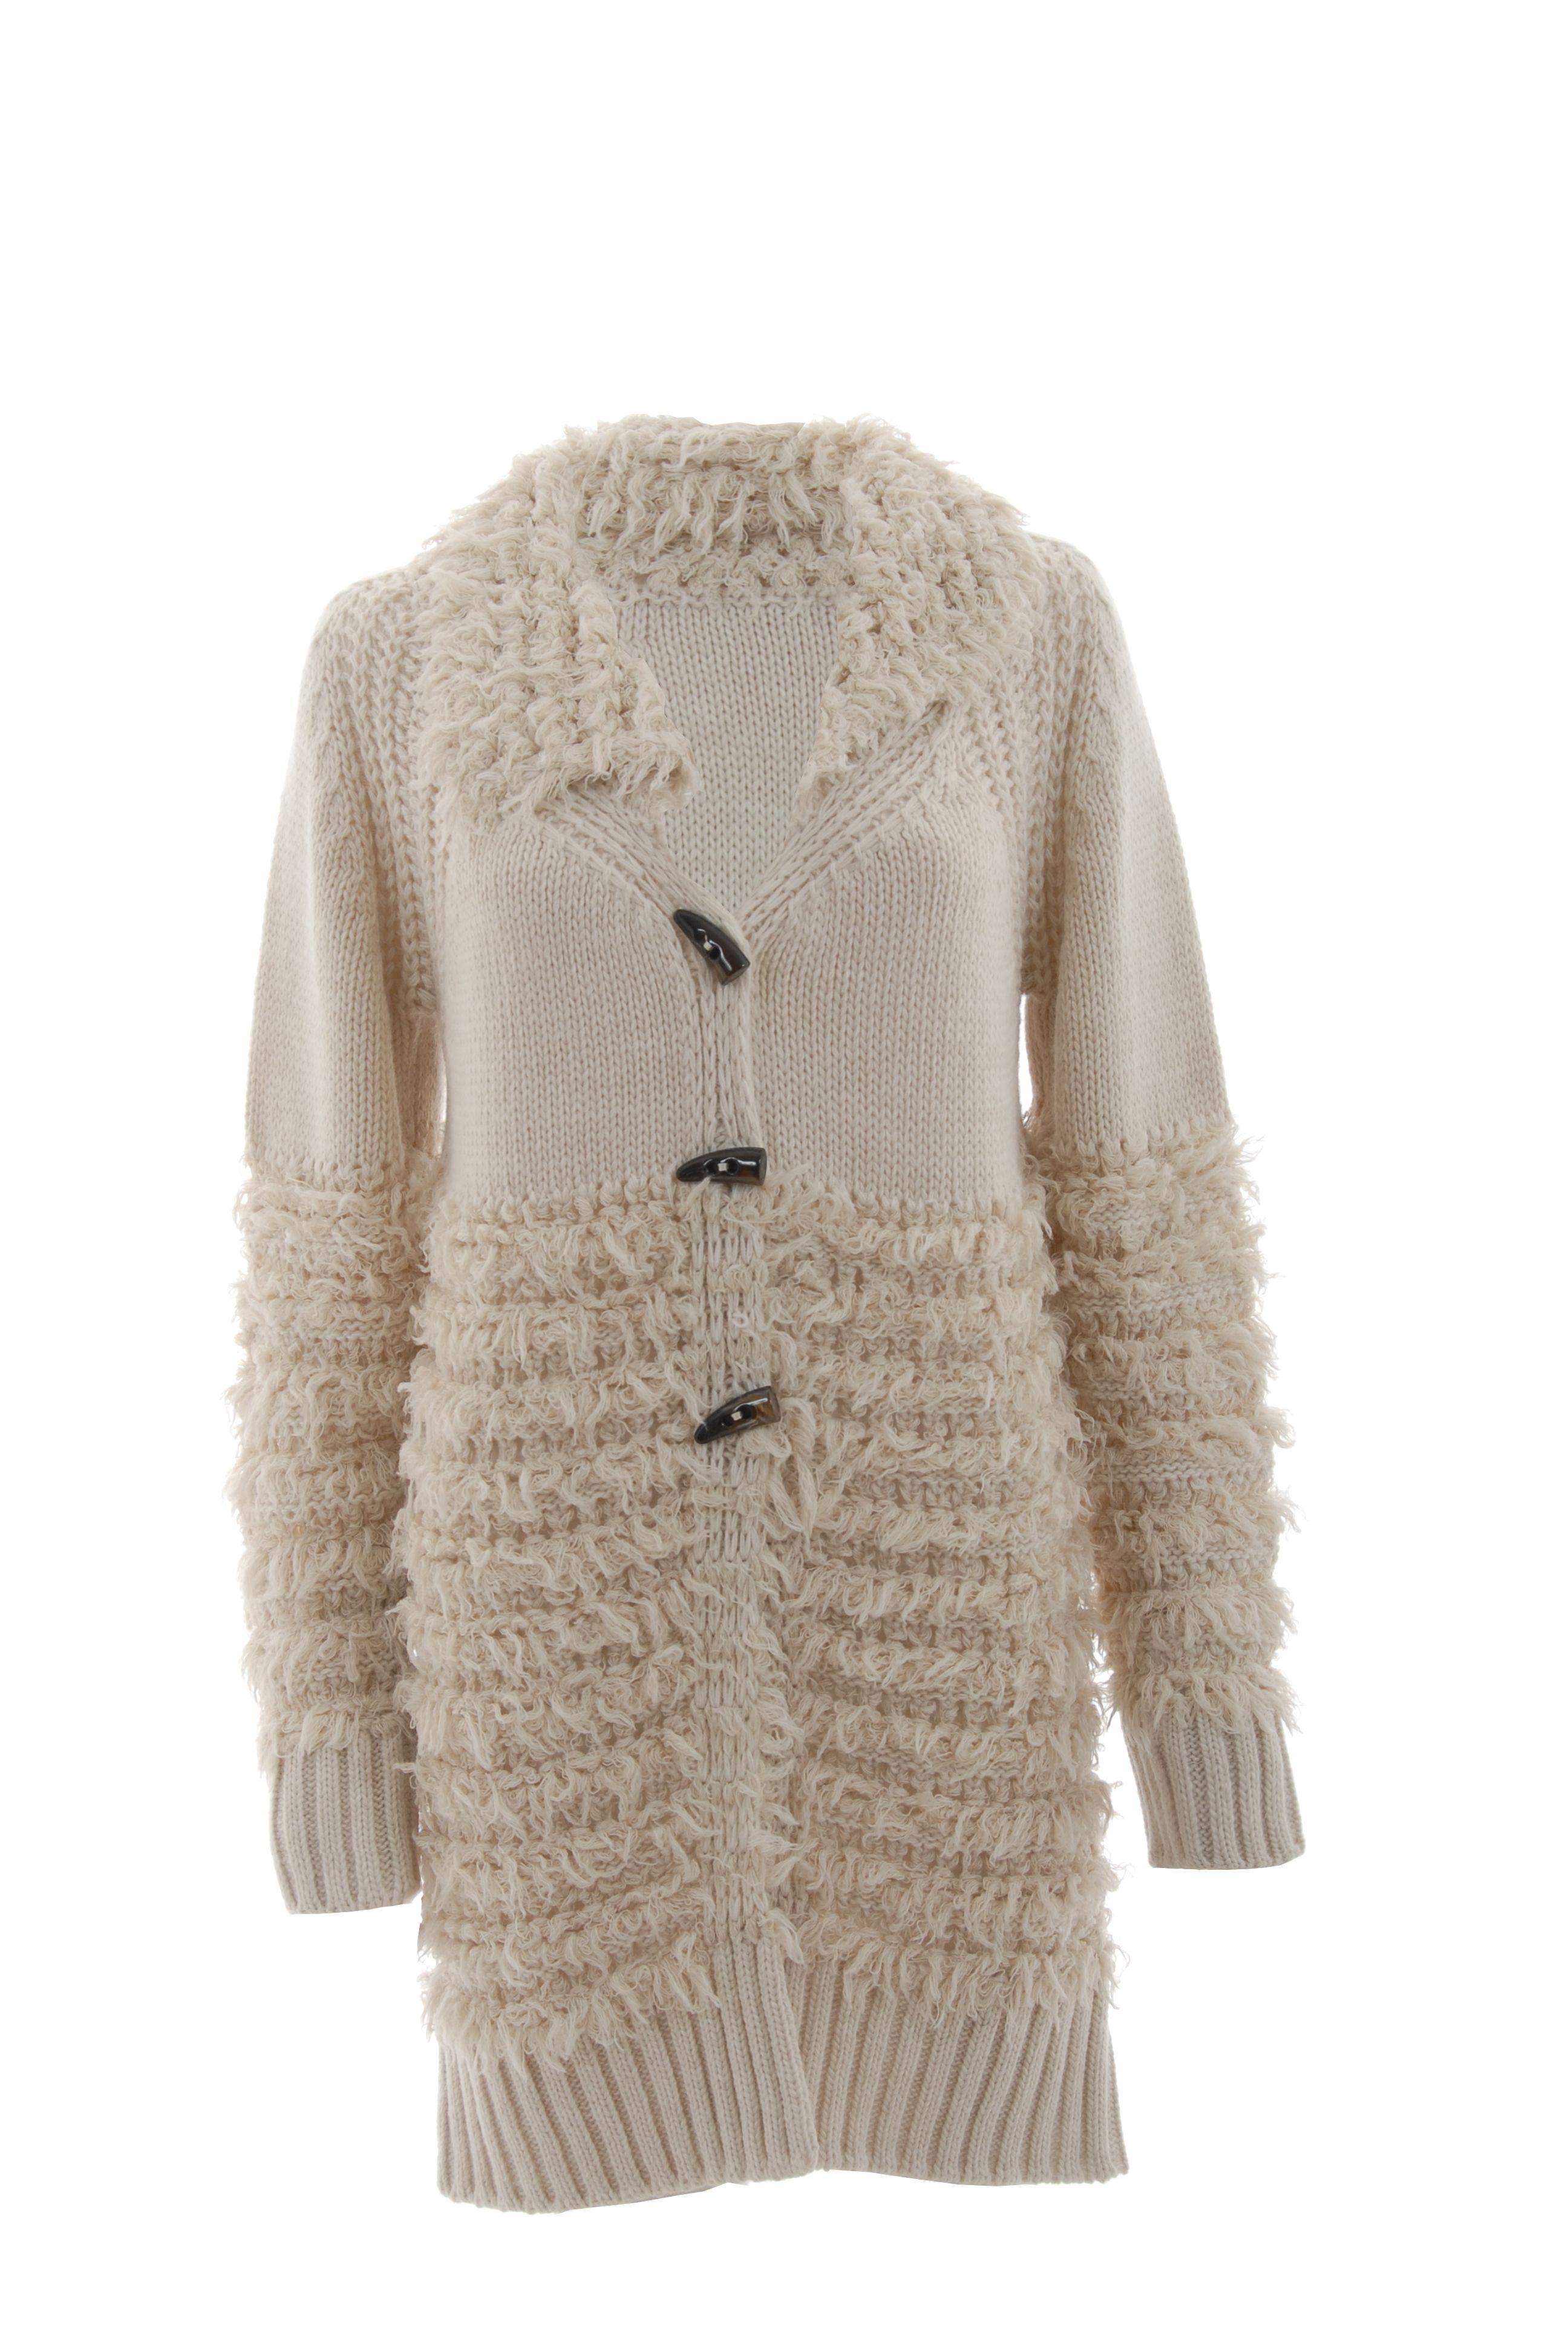 Cappotto ecrù lana lunga 3 alamari